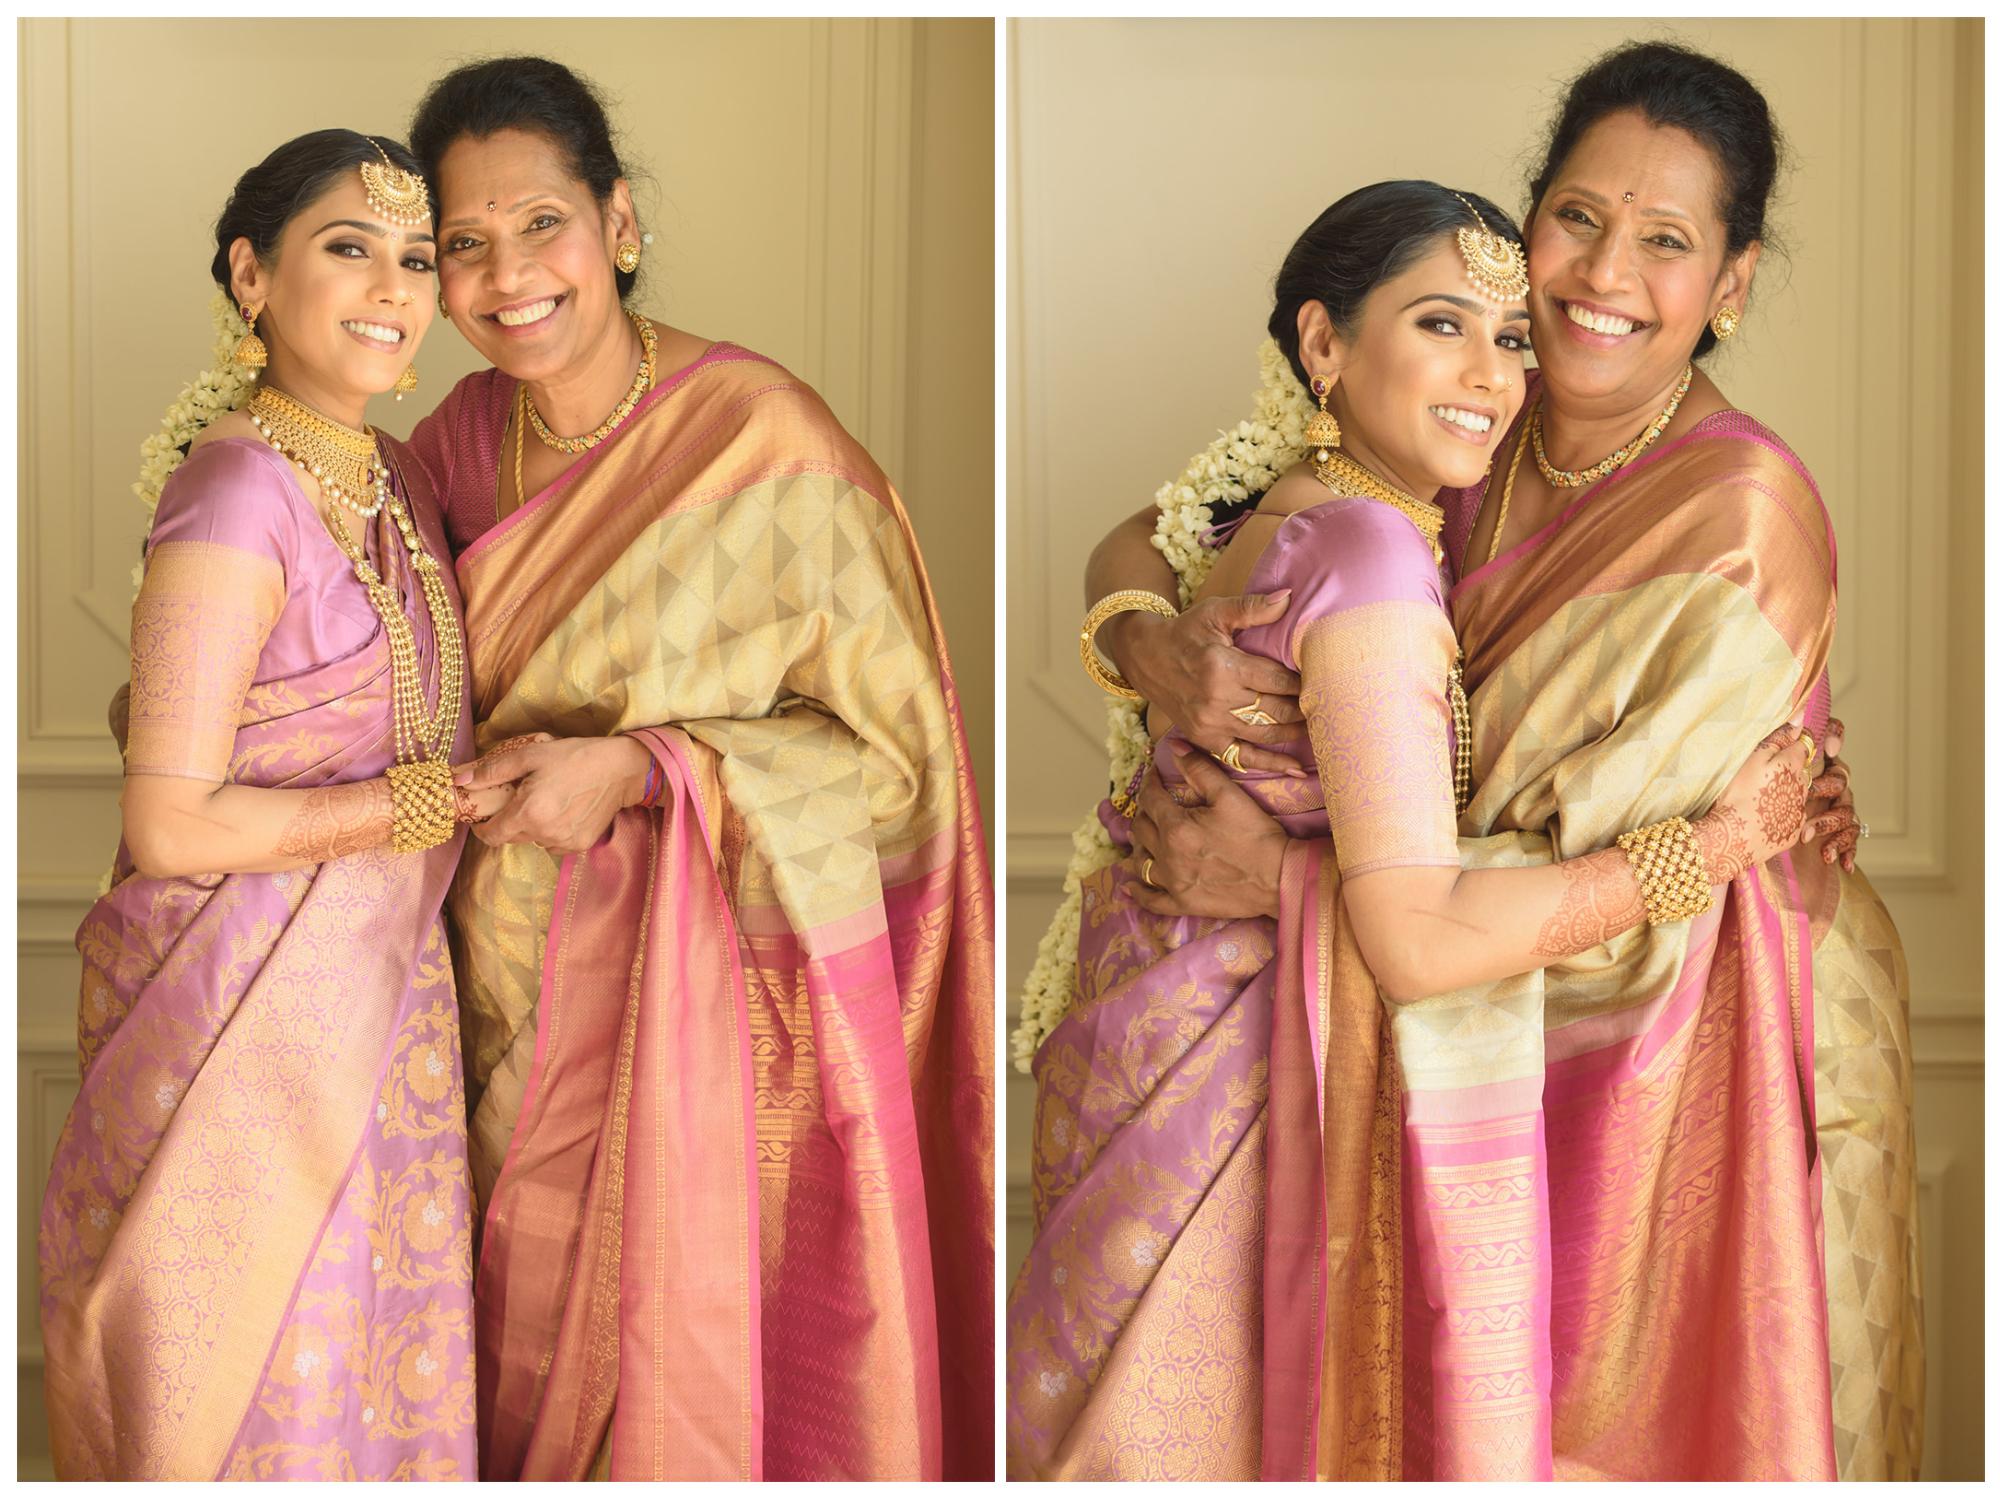 Tamil-Gujrati-hindu-wedding-photography-photographer-london-the-savoy--17.jpg